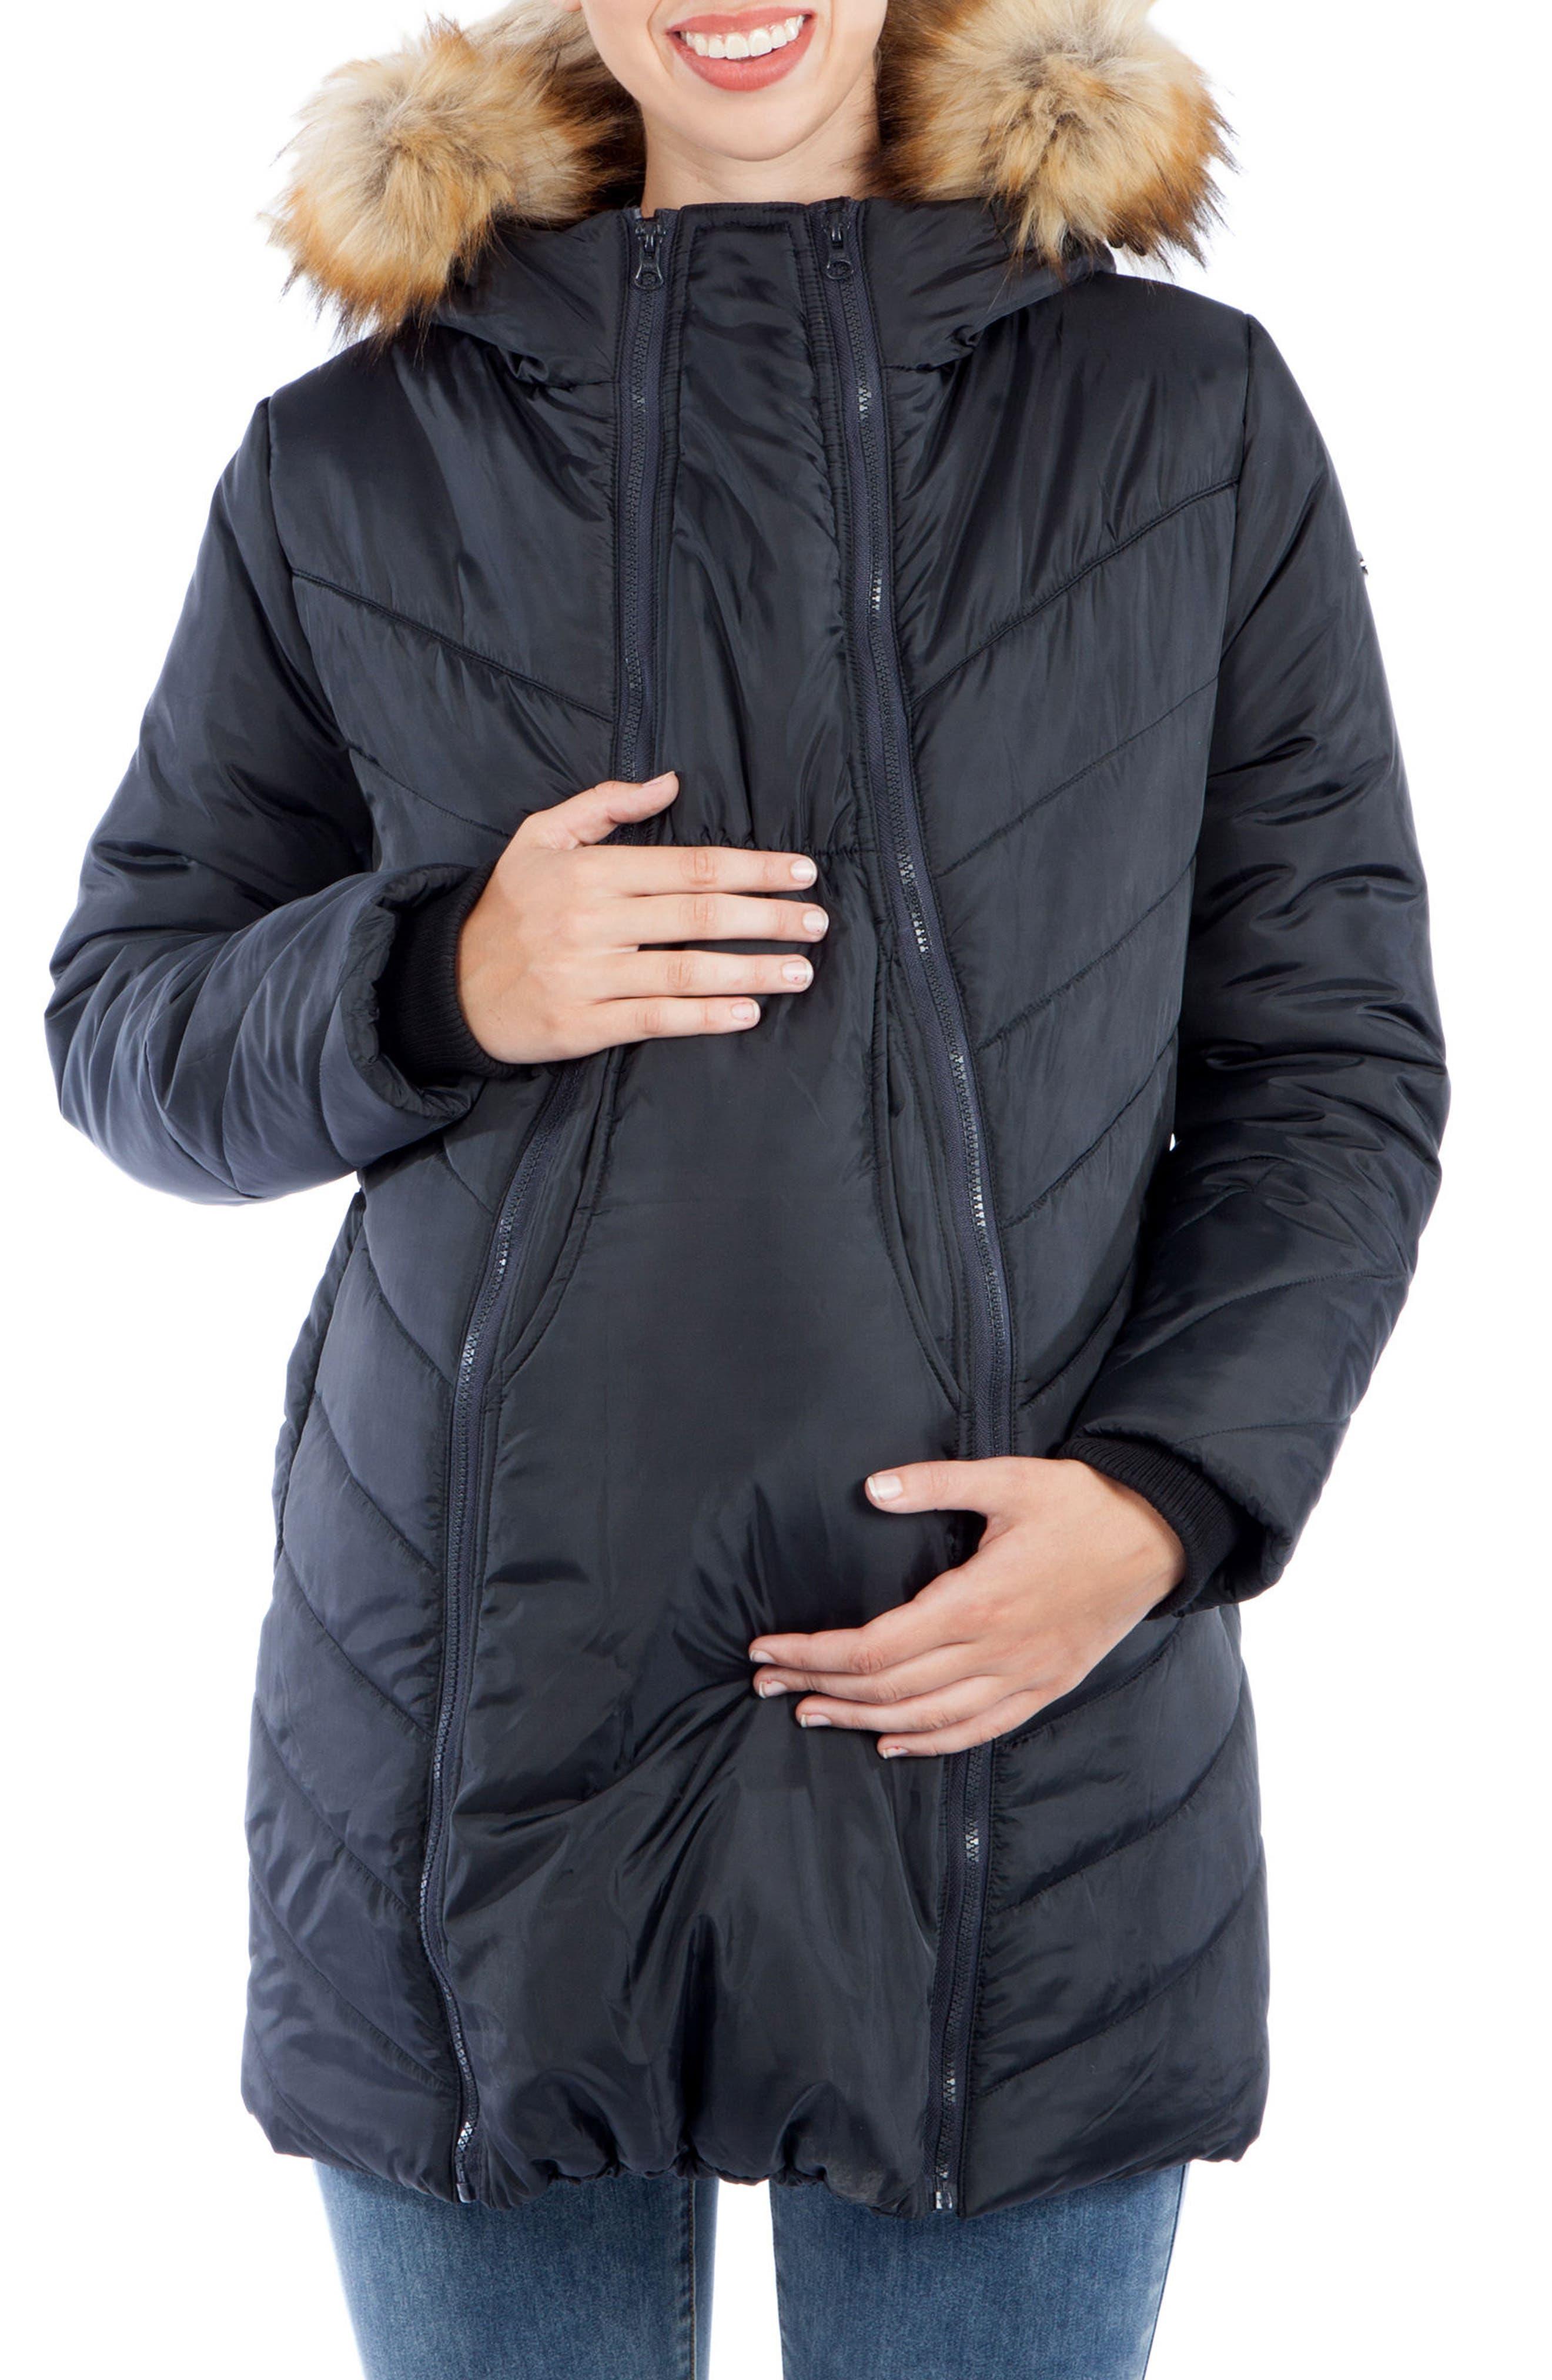 MODERN ETERNITY, Faux Fur Trim Convertible Puffer 3-in-1 Maternity Jacket, Alternate thumbnail 6, color, BLACK